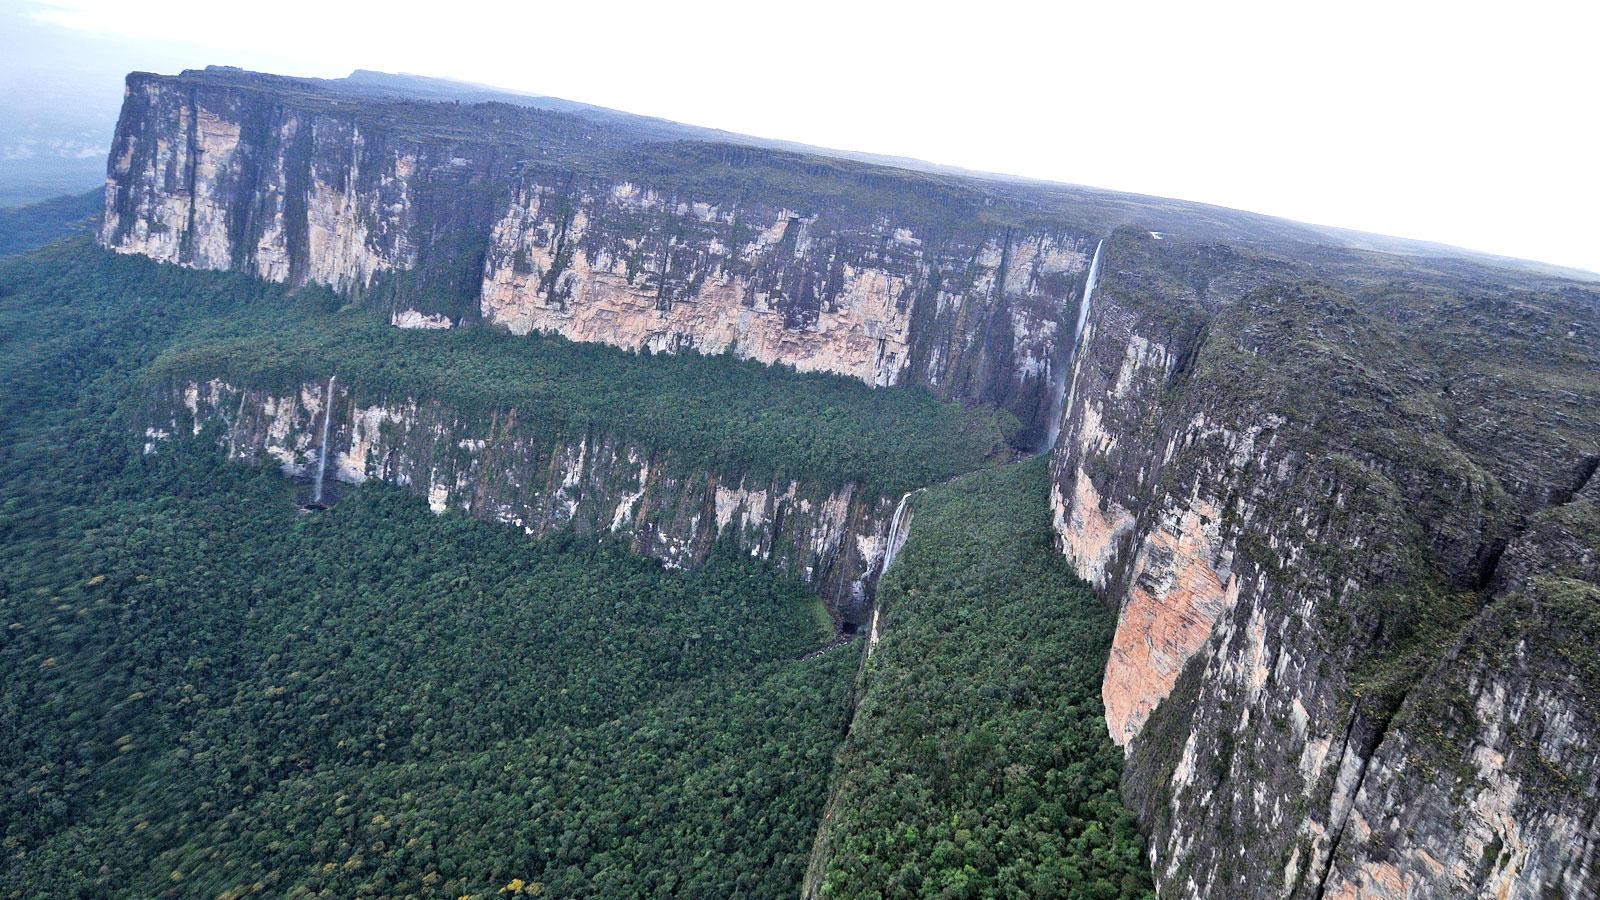 Roraima Trekking in Venezuela traveljunkies